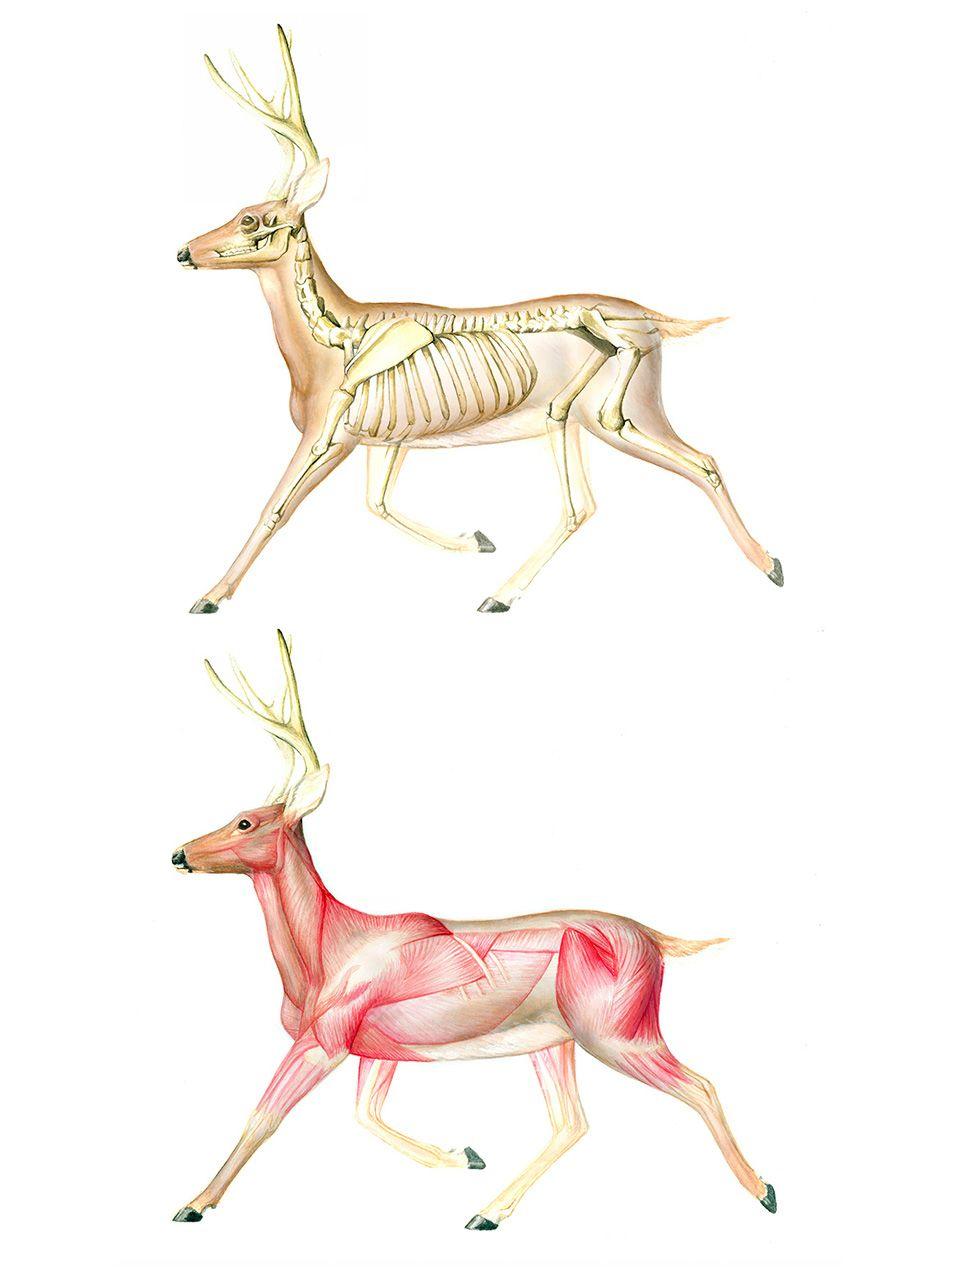 Running deer - skeleton & musculature   Anatomy - animal ...